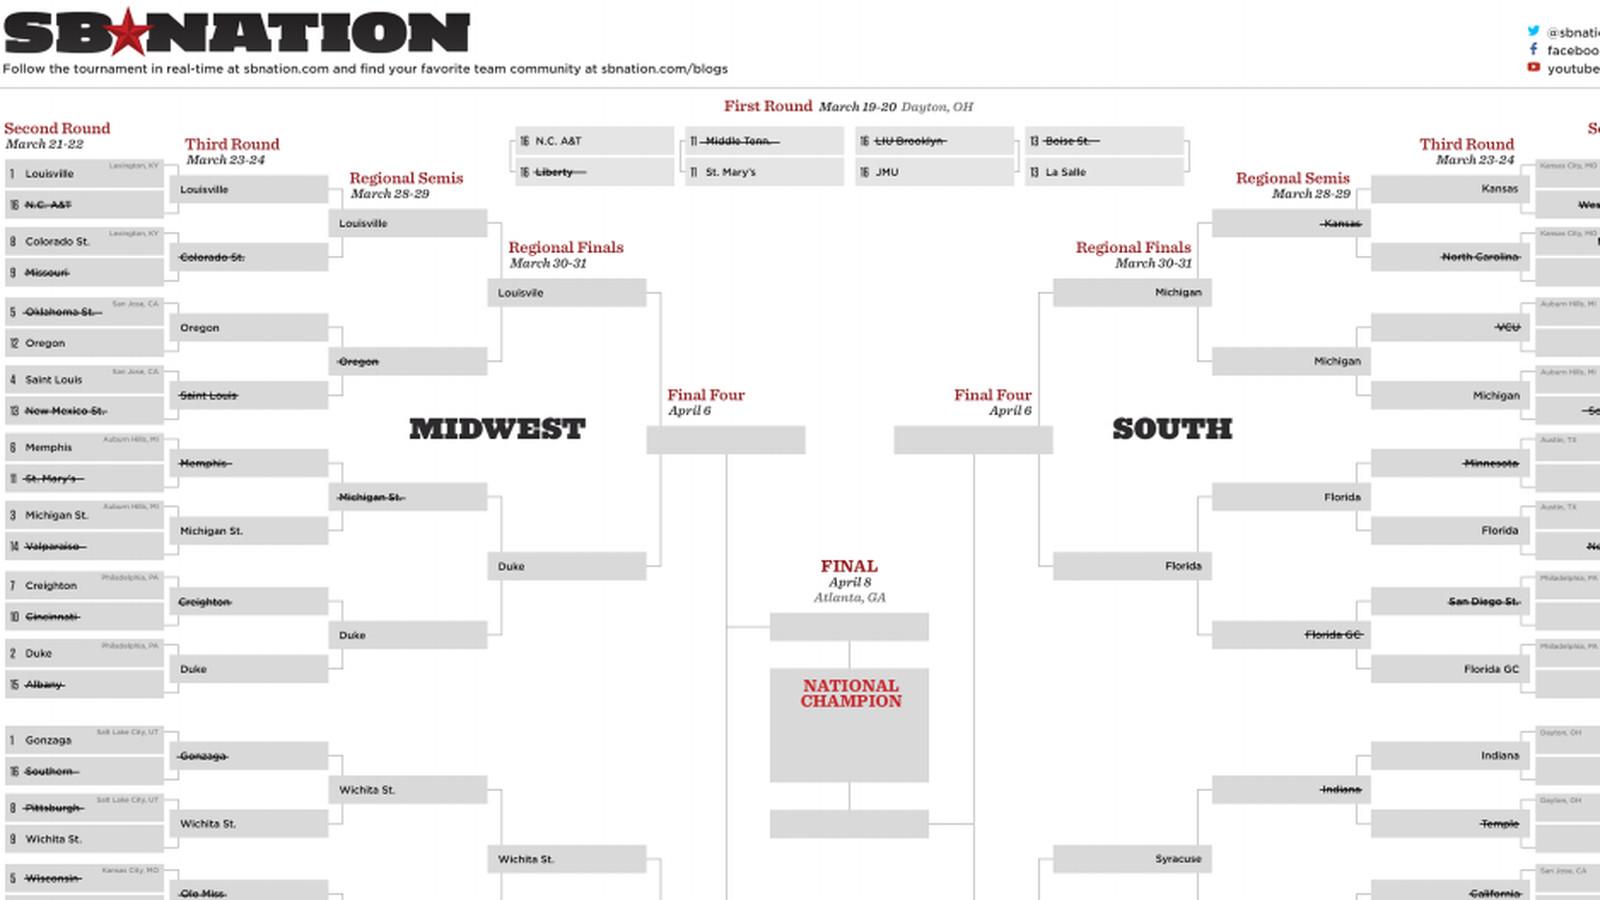 2013 printable NCAA bracket: Elite Eight matchups set